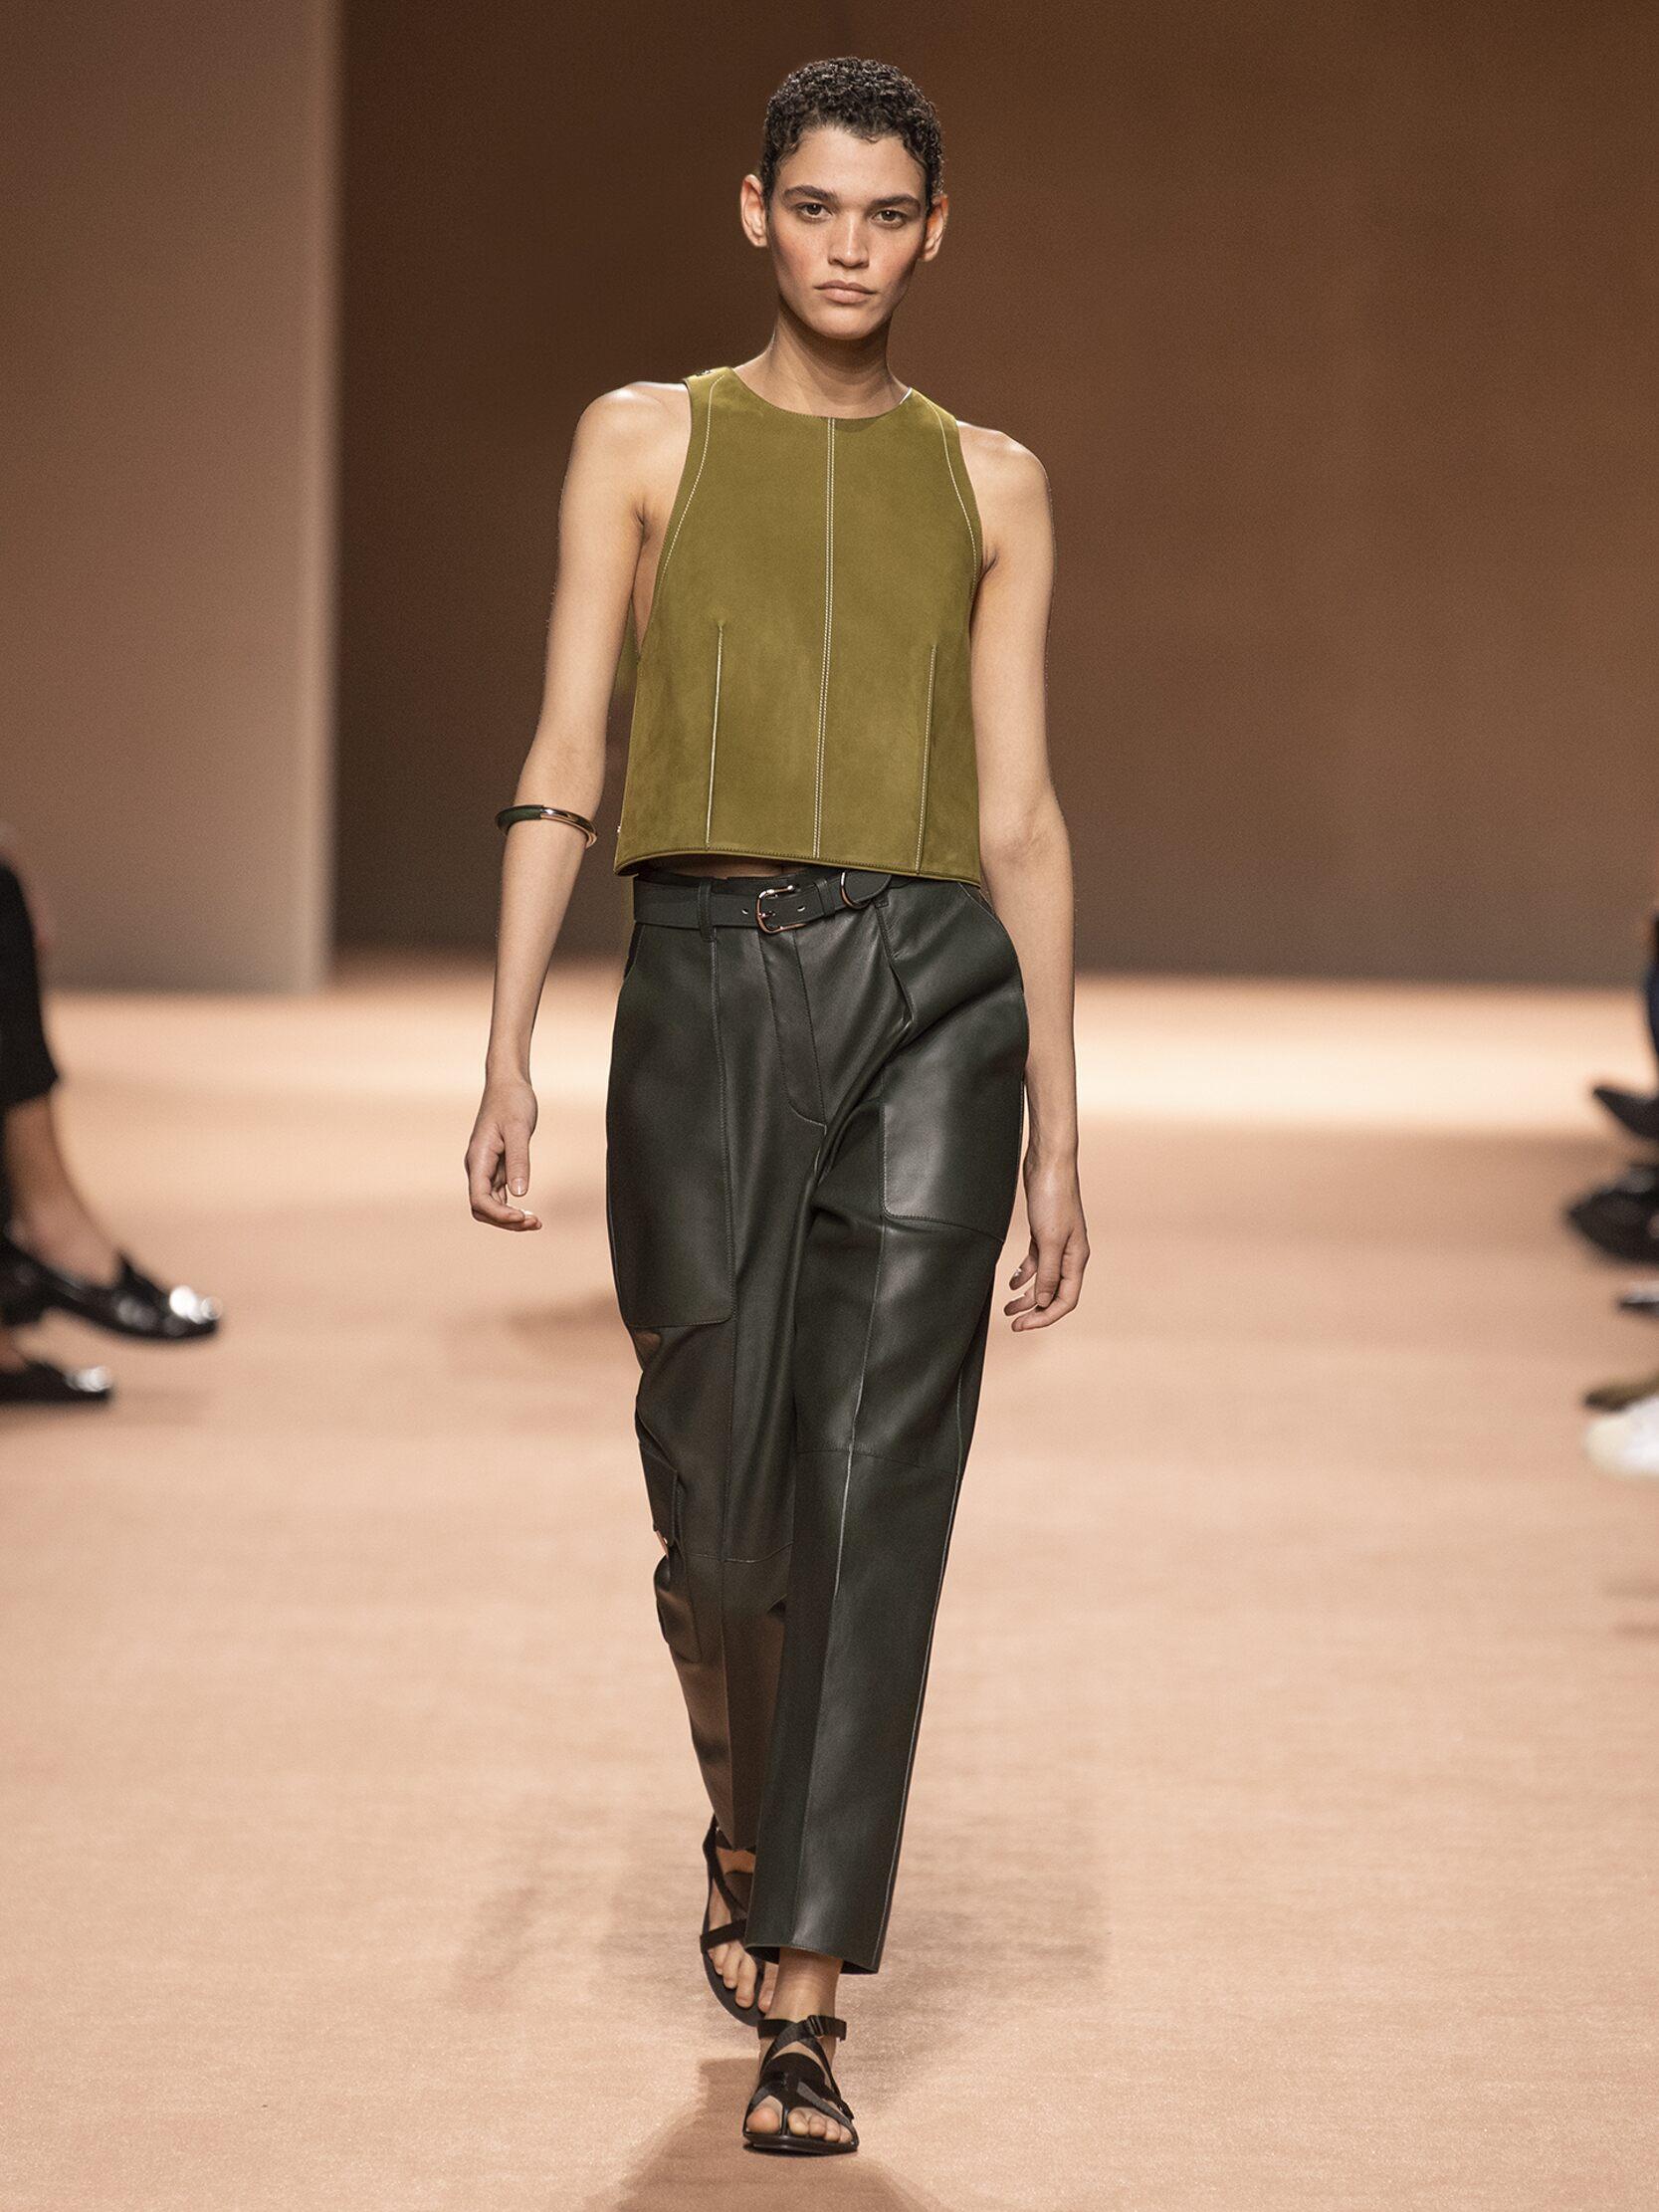 Hermès Fashion Show SS 2020